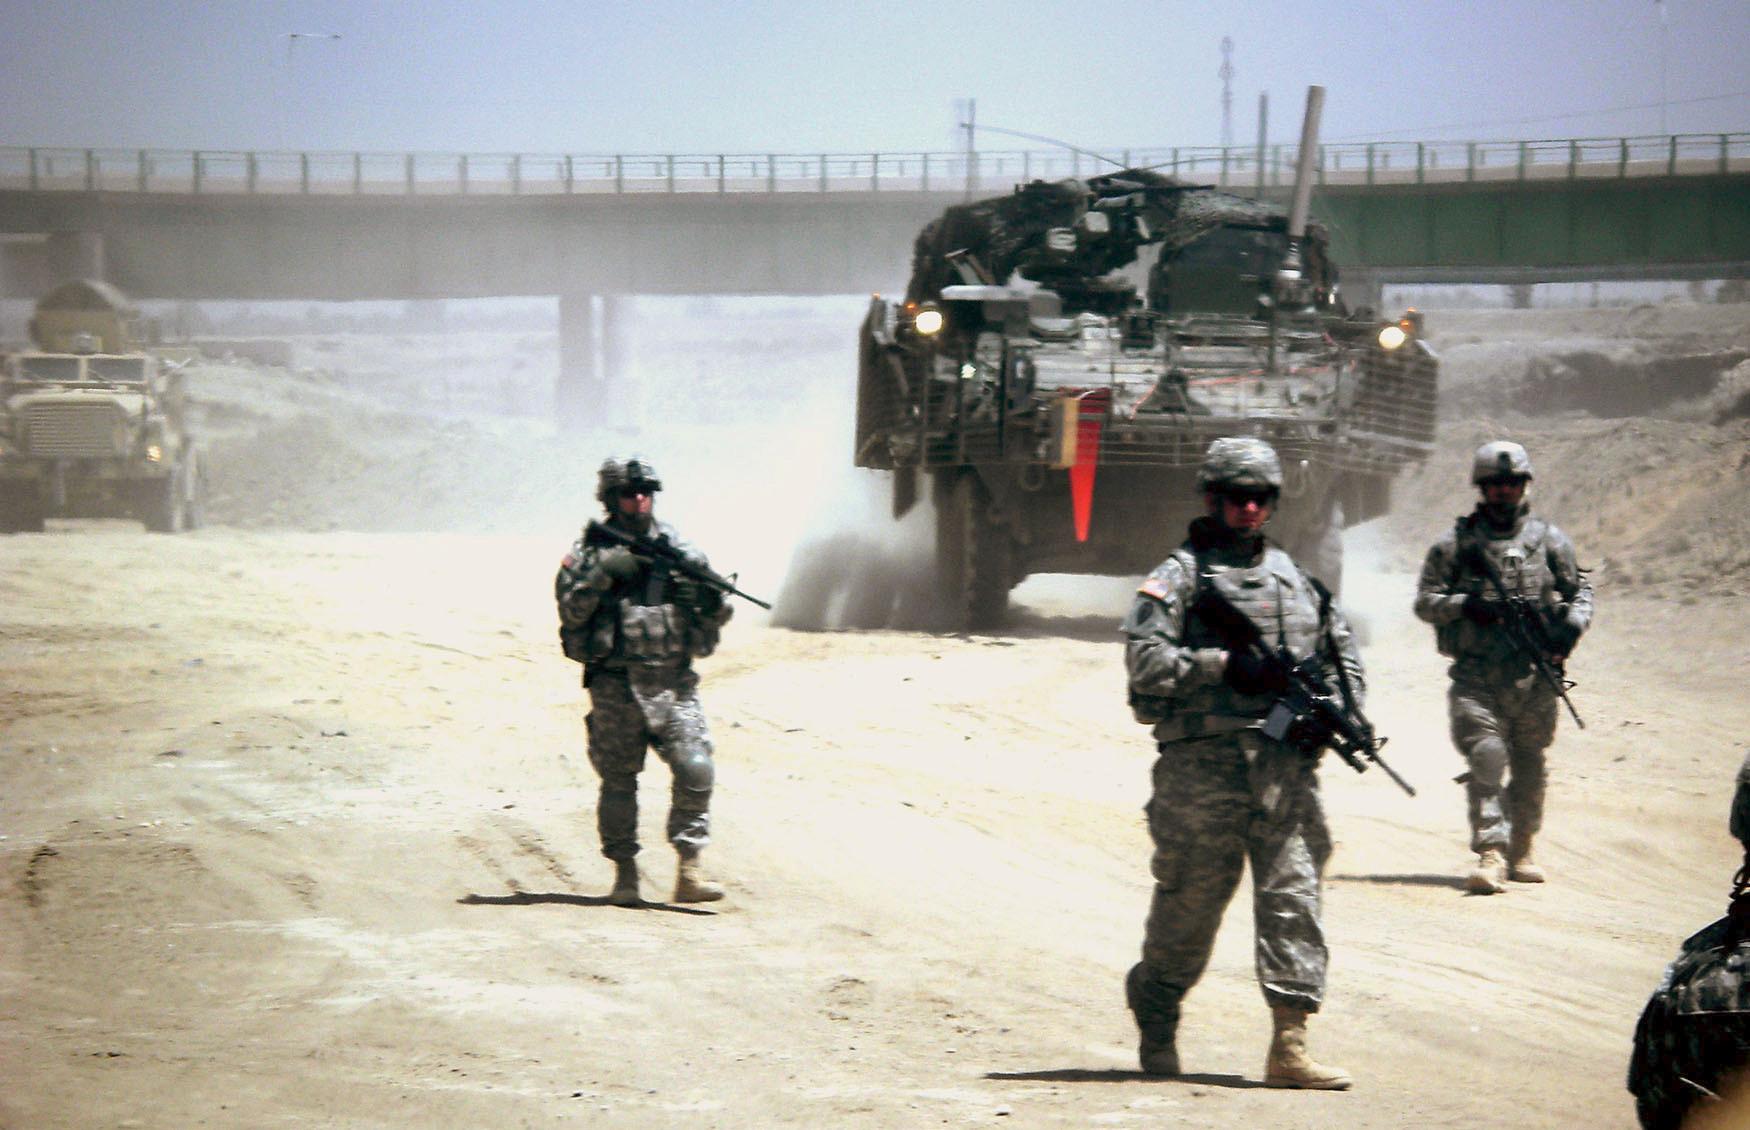 Stryker Brigade Combat Team